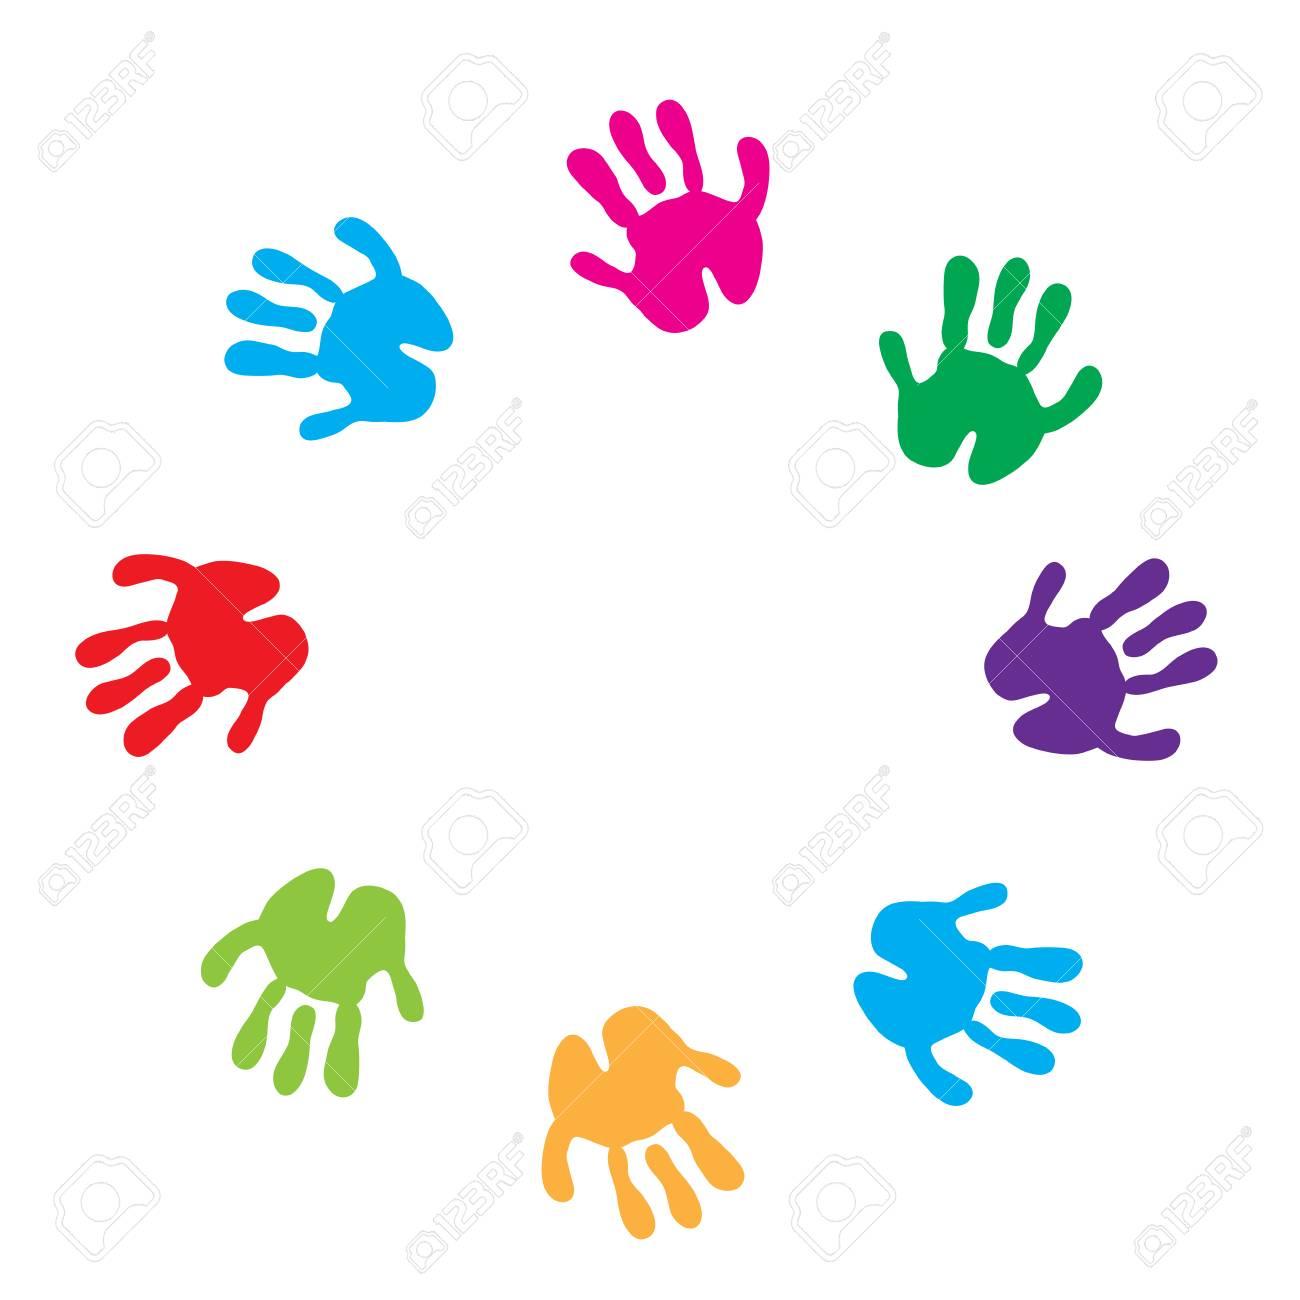 Children hand prints frame. Children's palms on a white background.